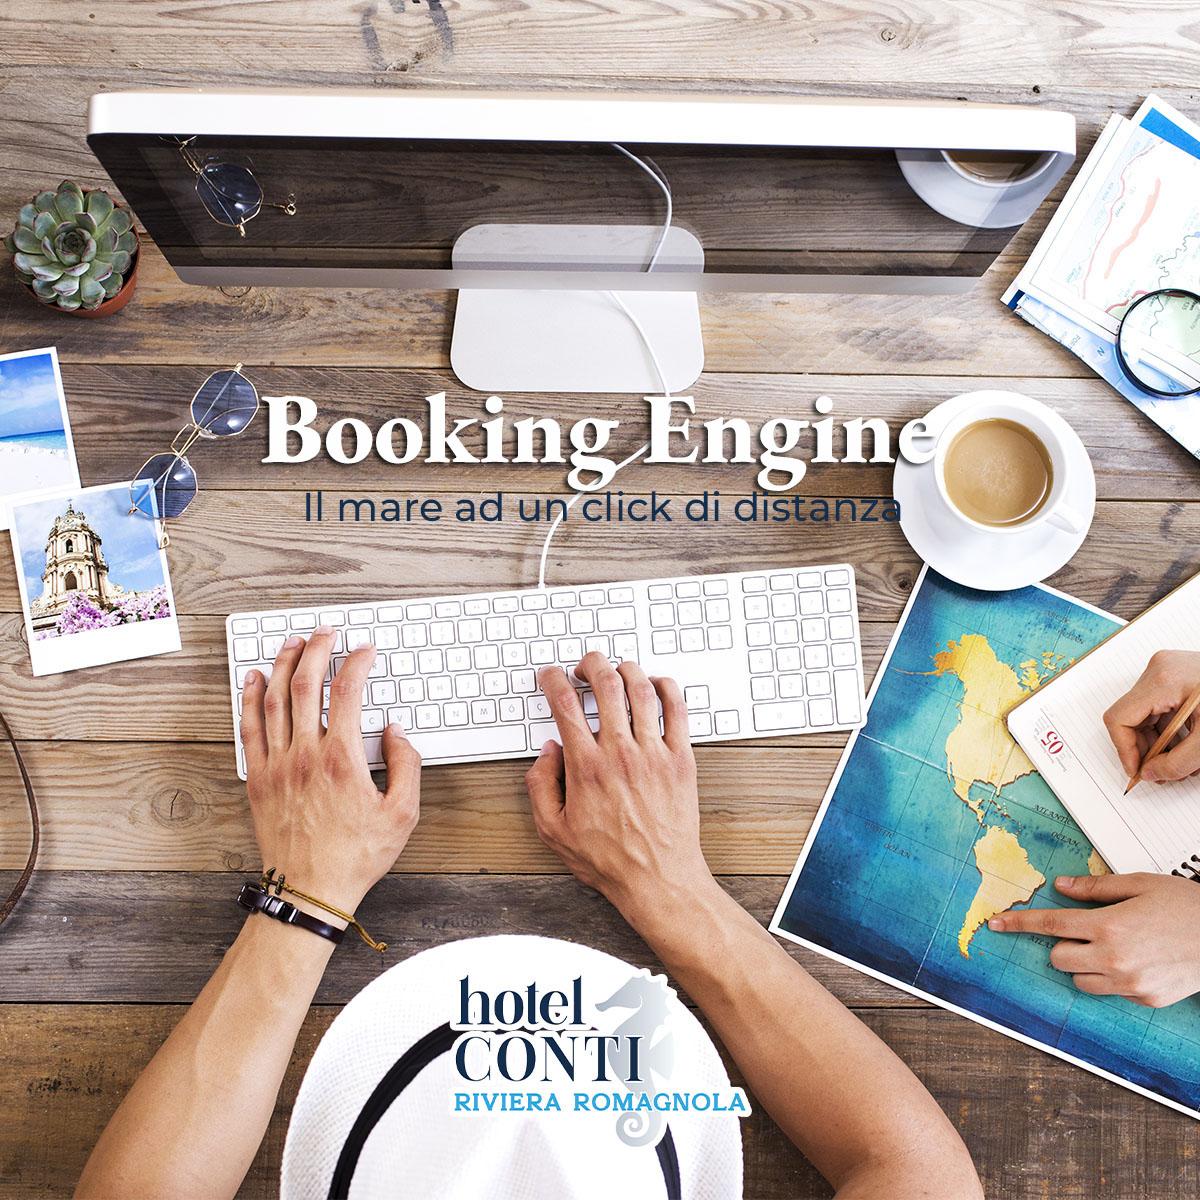 Booking Engine disponibile ora!